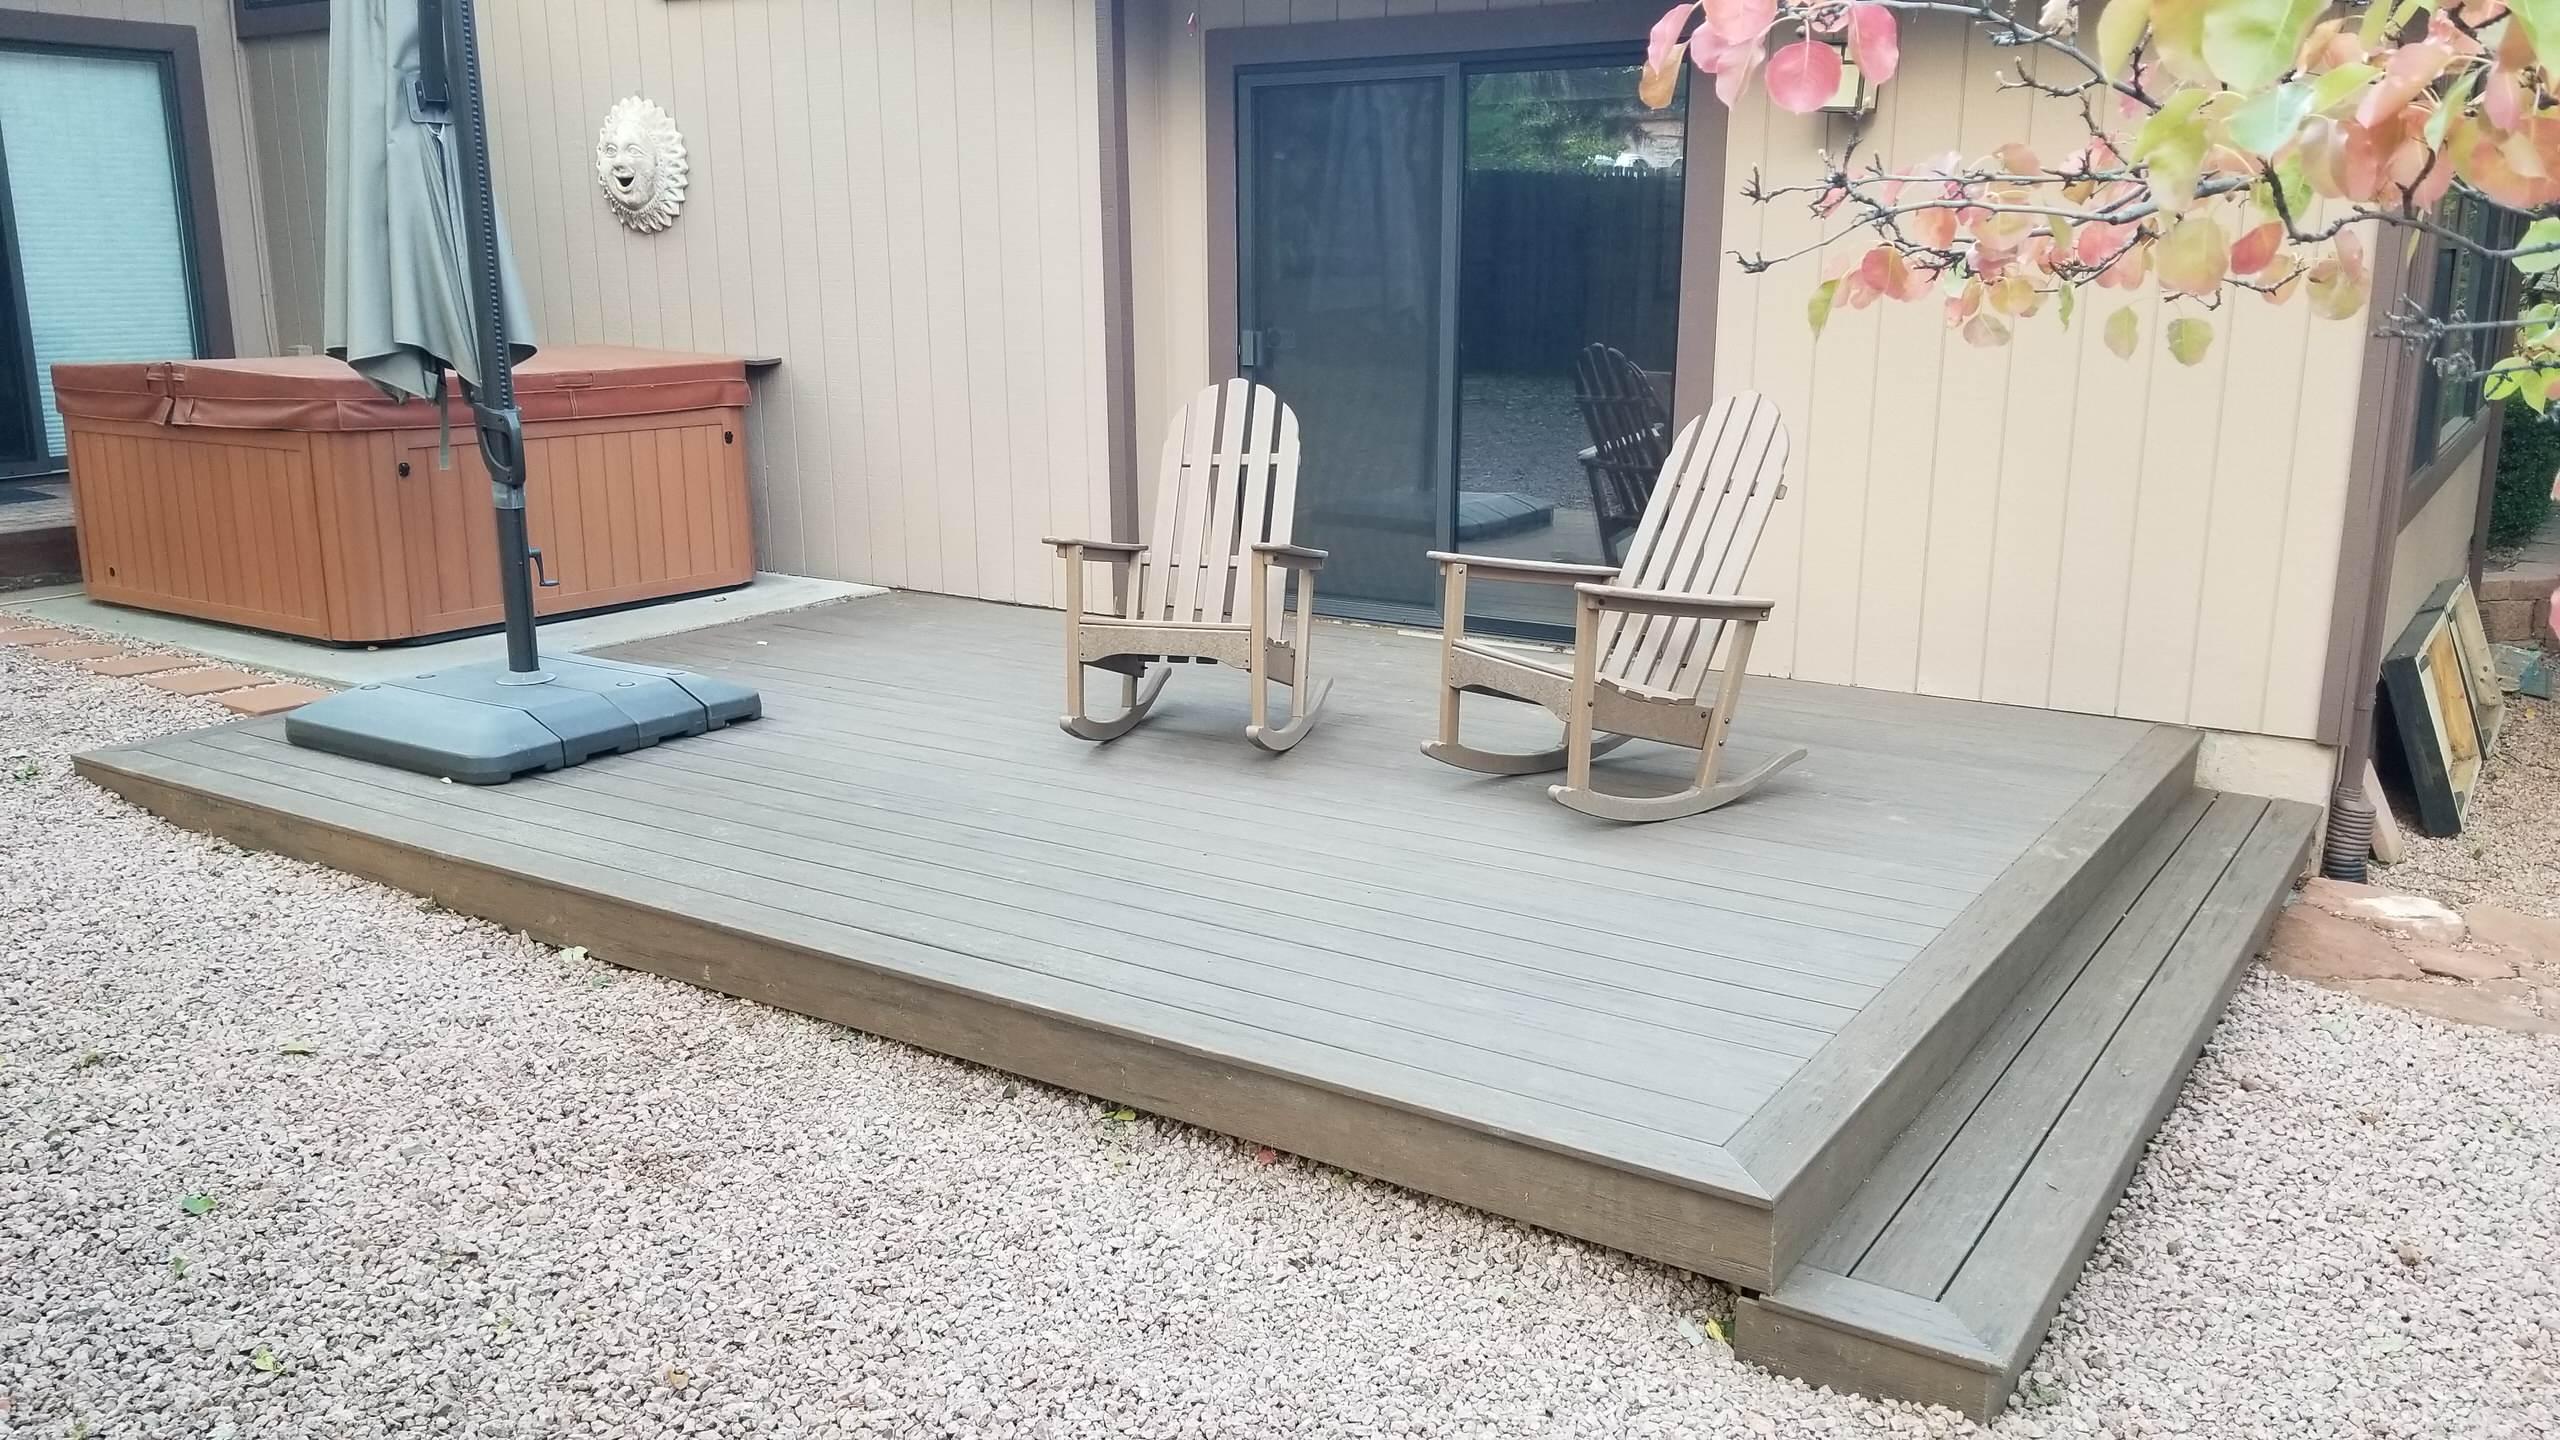 New composite decks are super easy outdoor hangouts